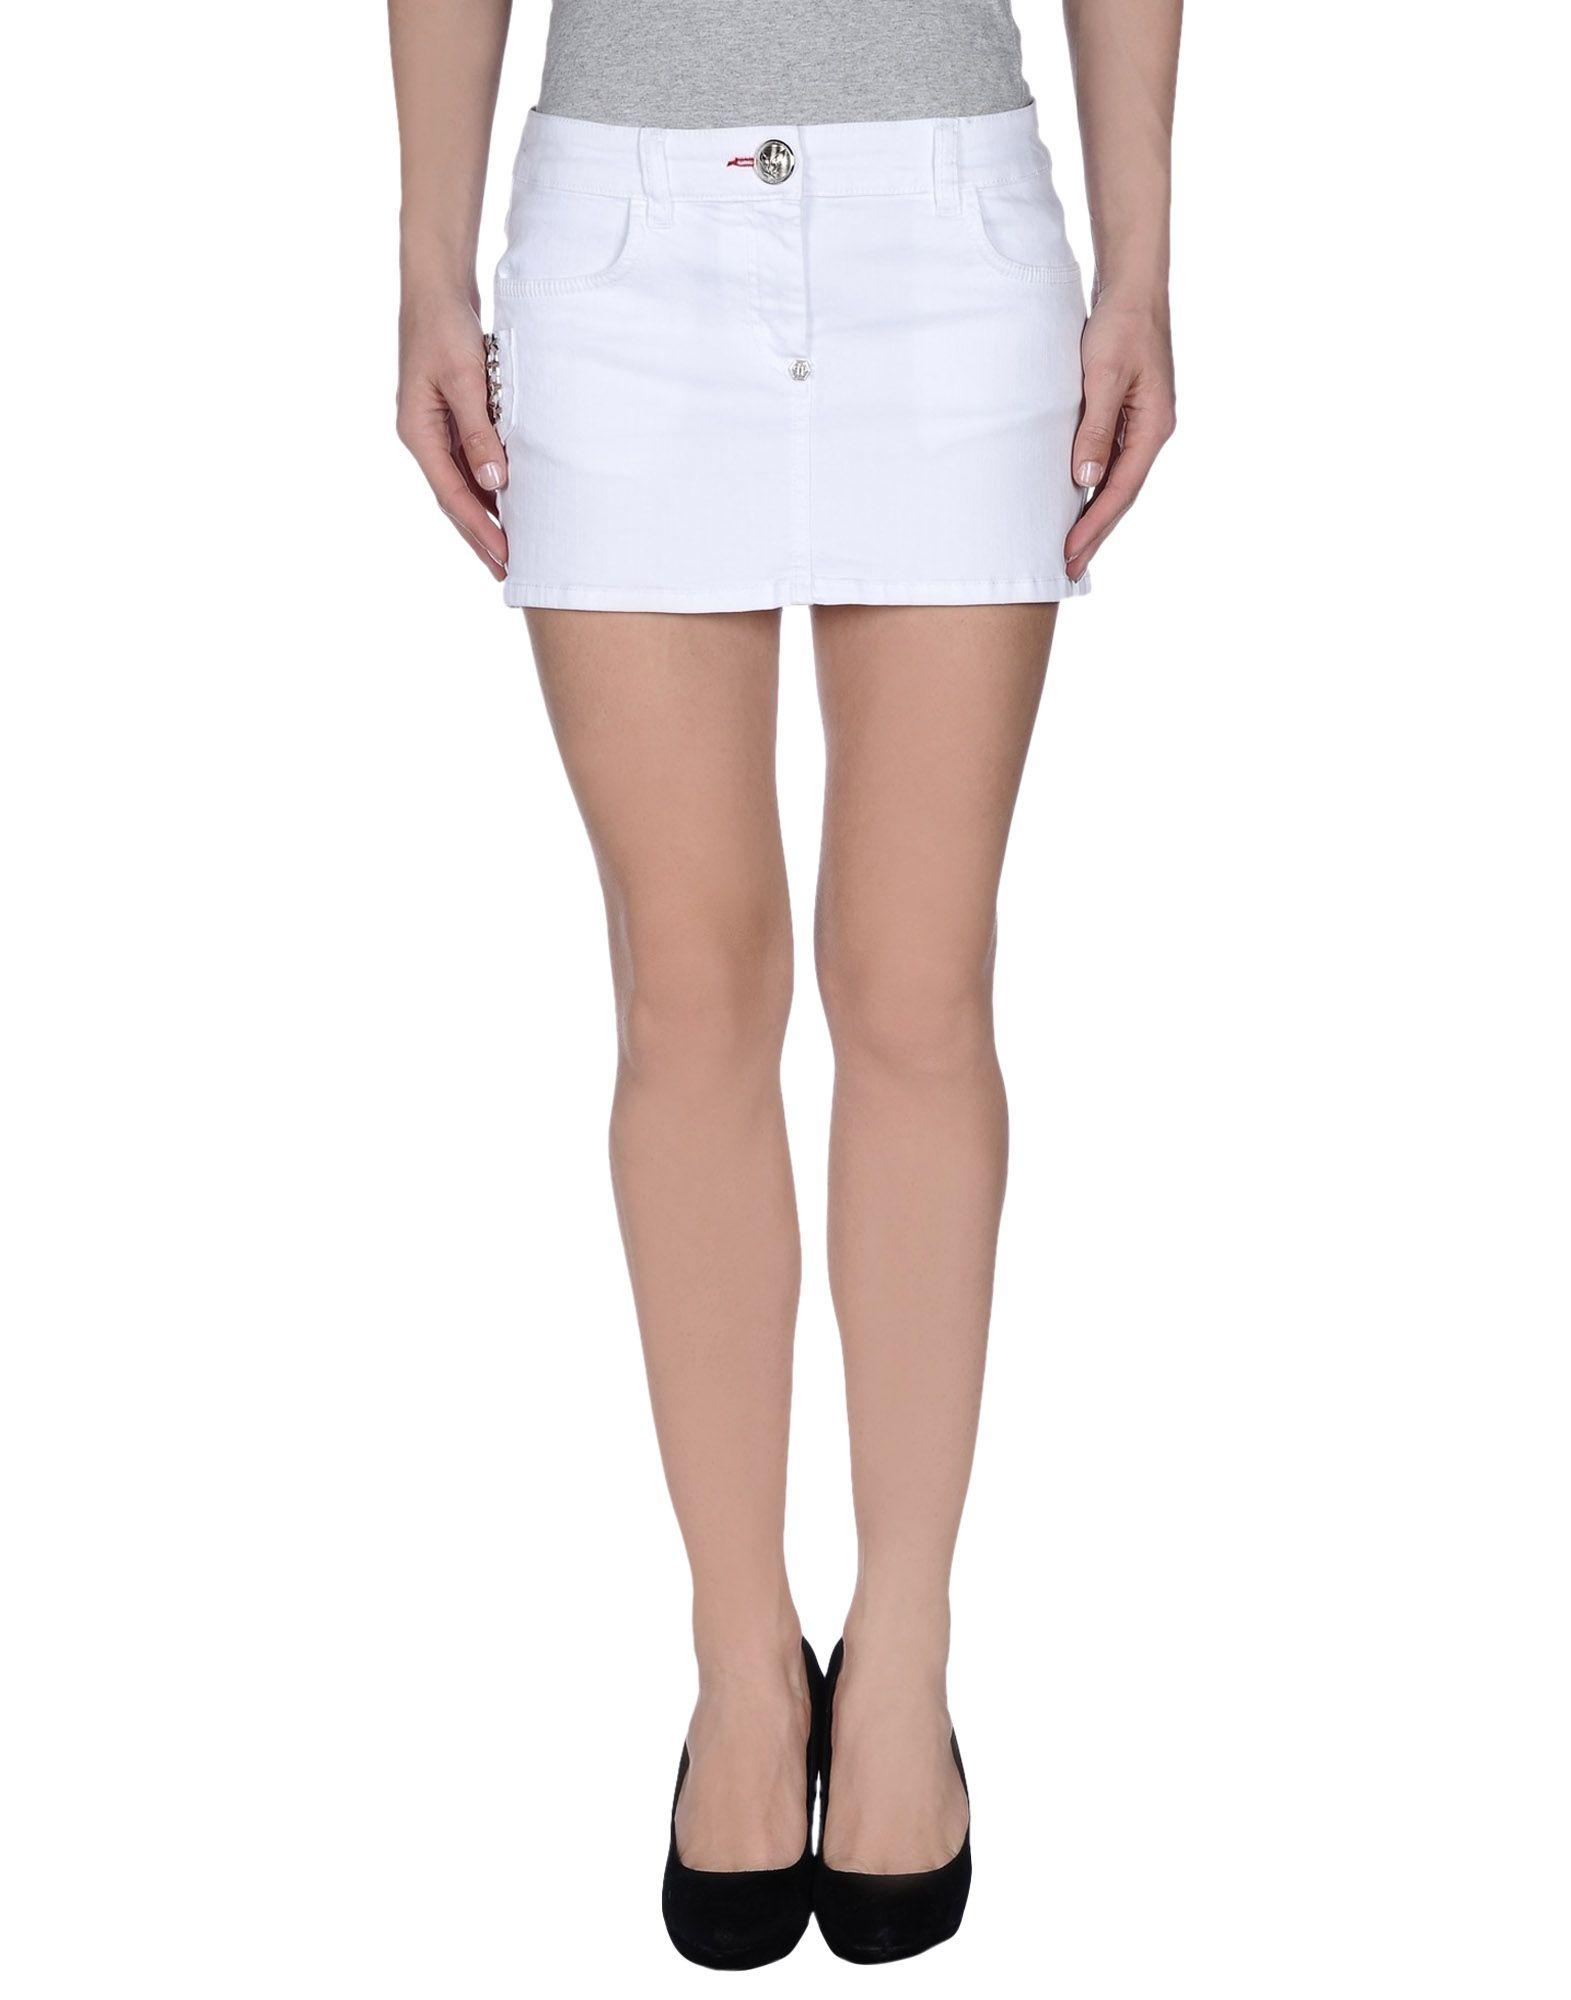 philipp plein white denim skirt lyst